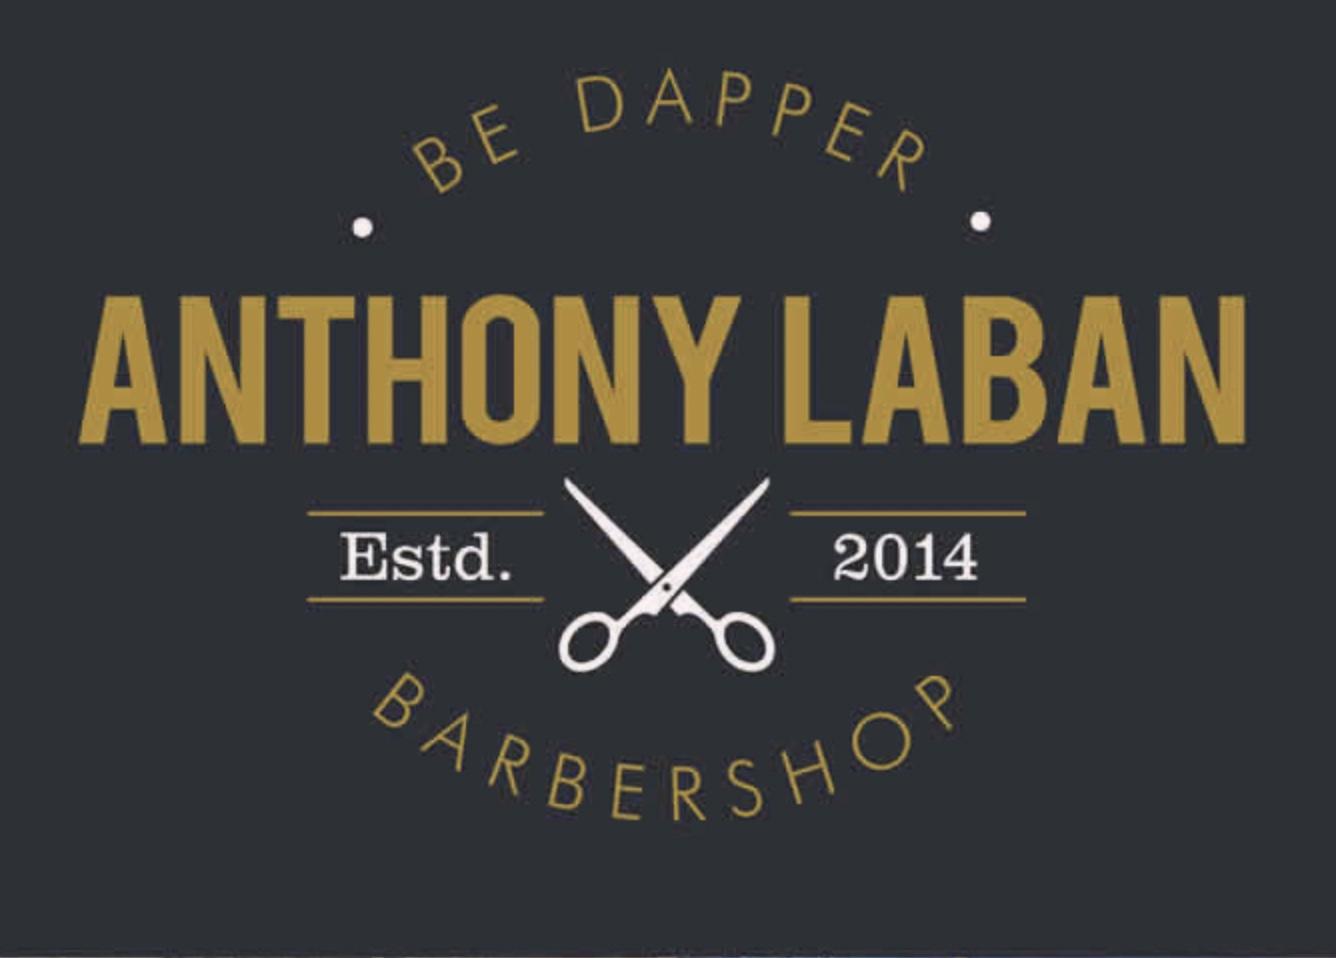 Anthony Laban Barbershop